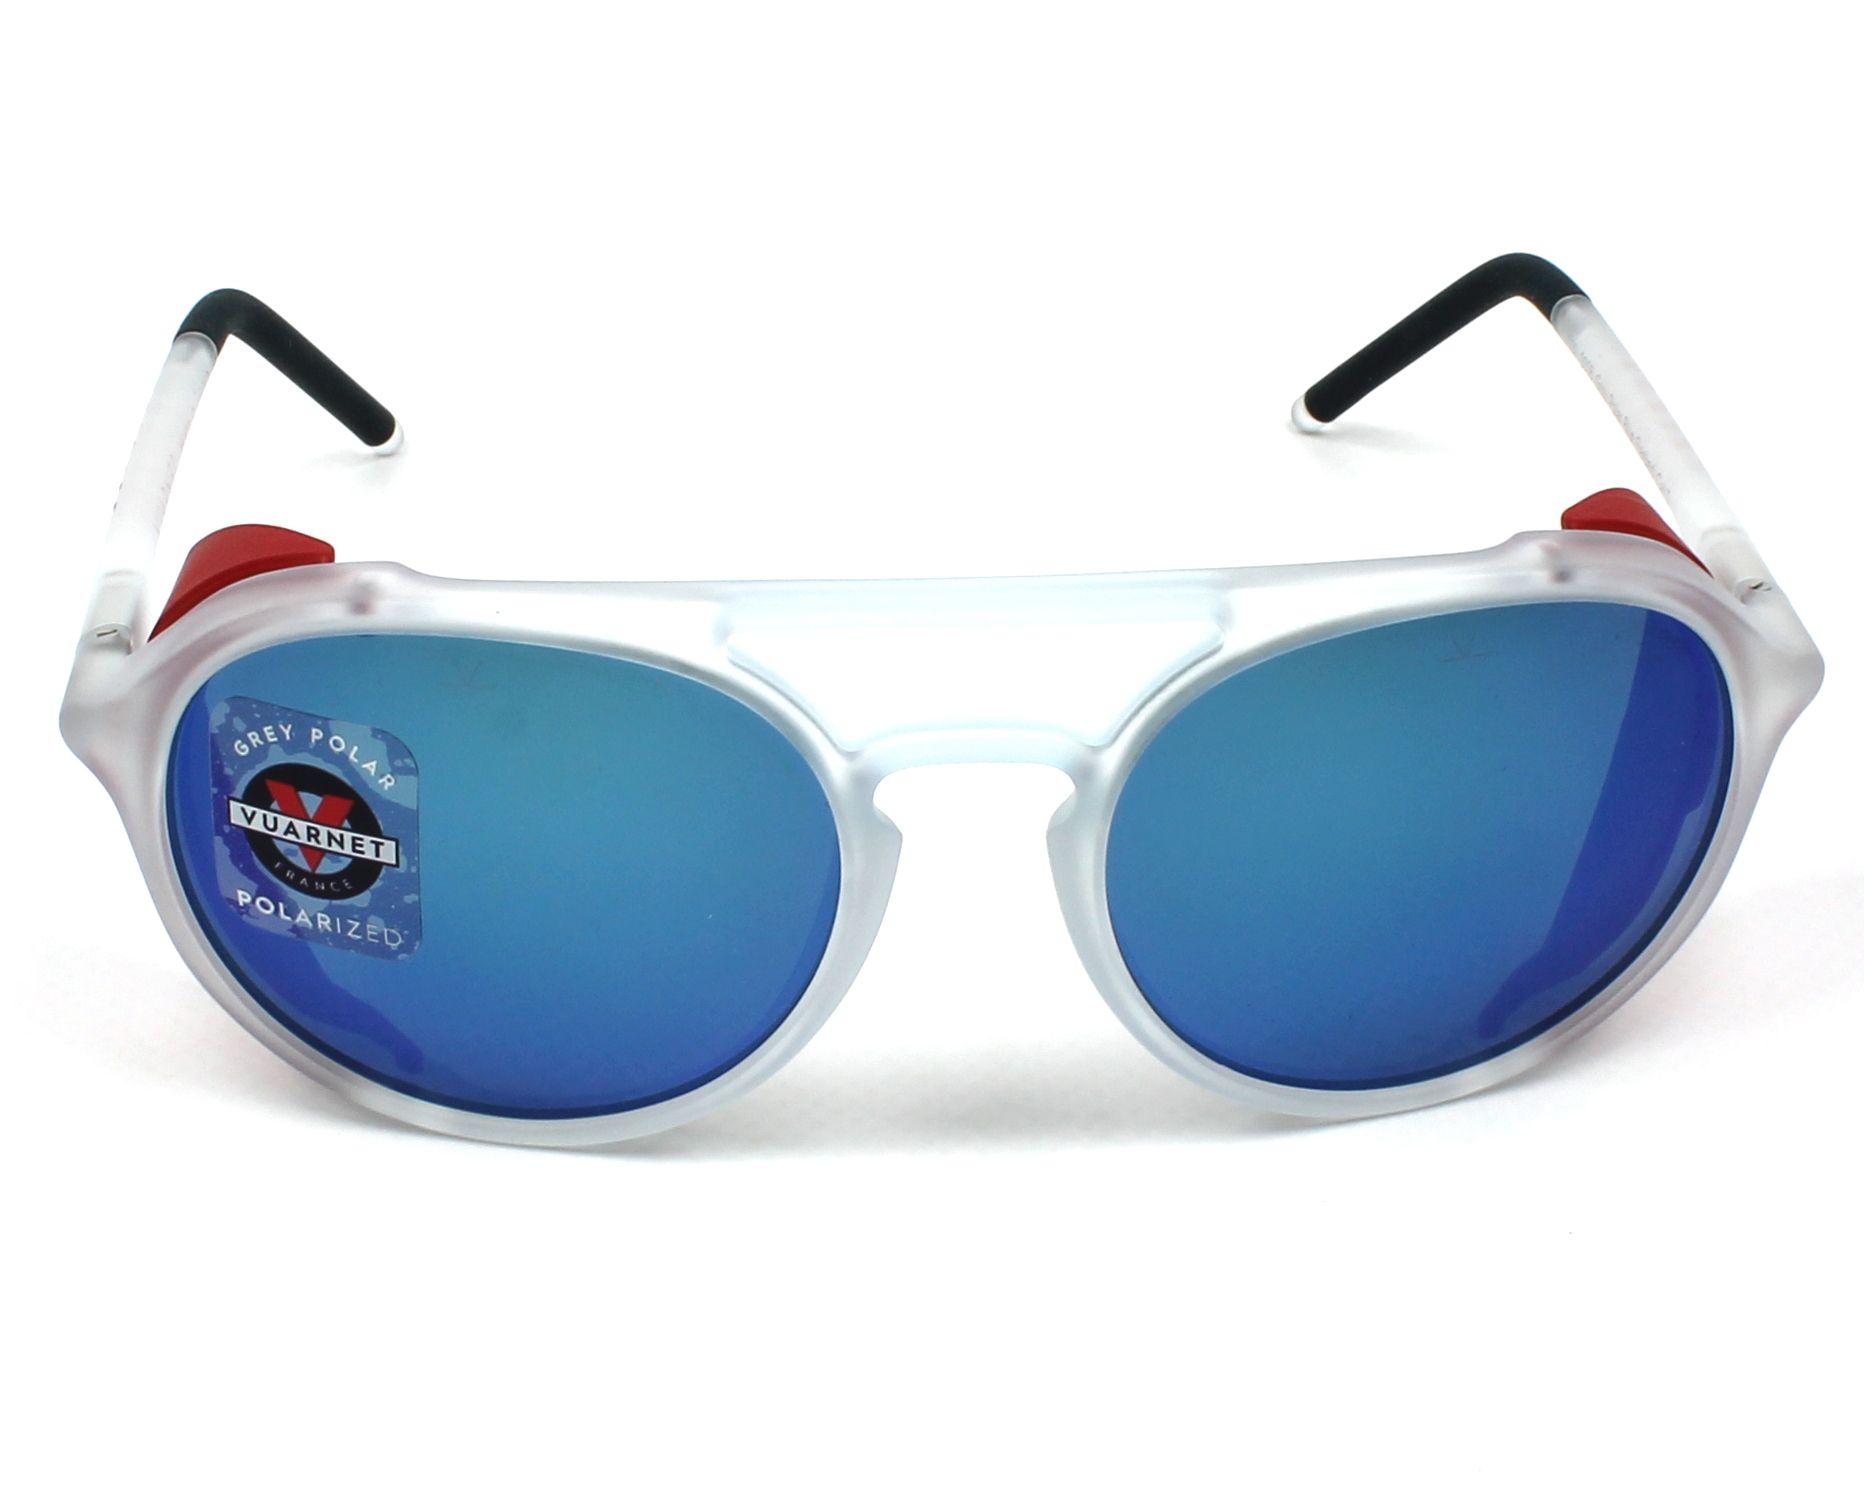 33c4608fbd8 Vuarnet Sunglasses VL-1709 0008-1626 Crystal - Visionet